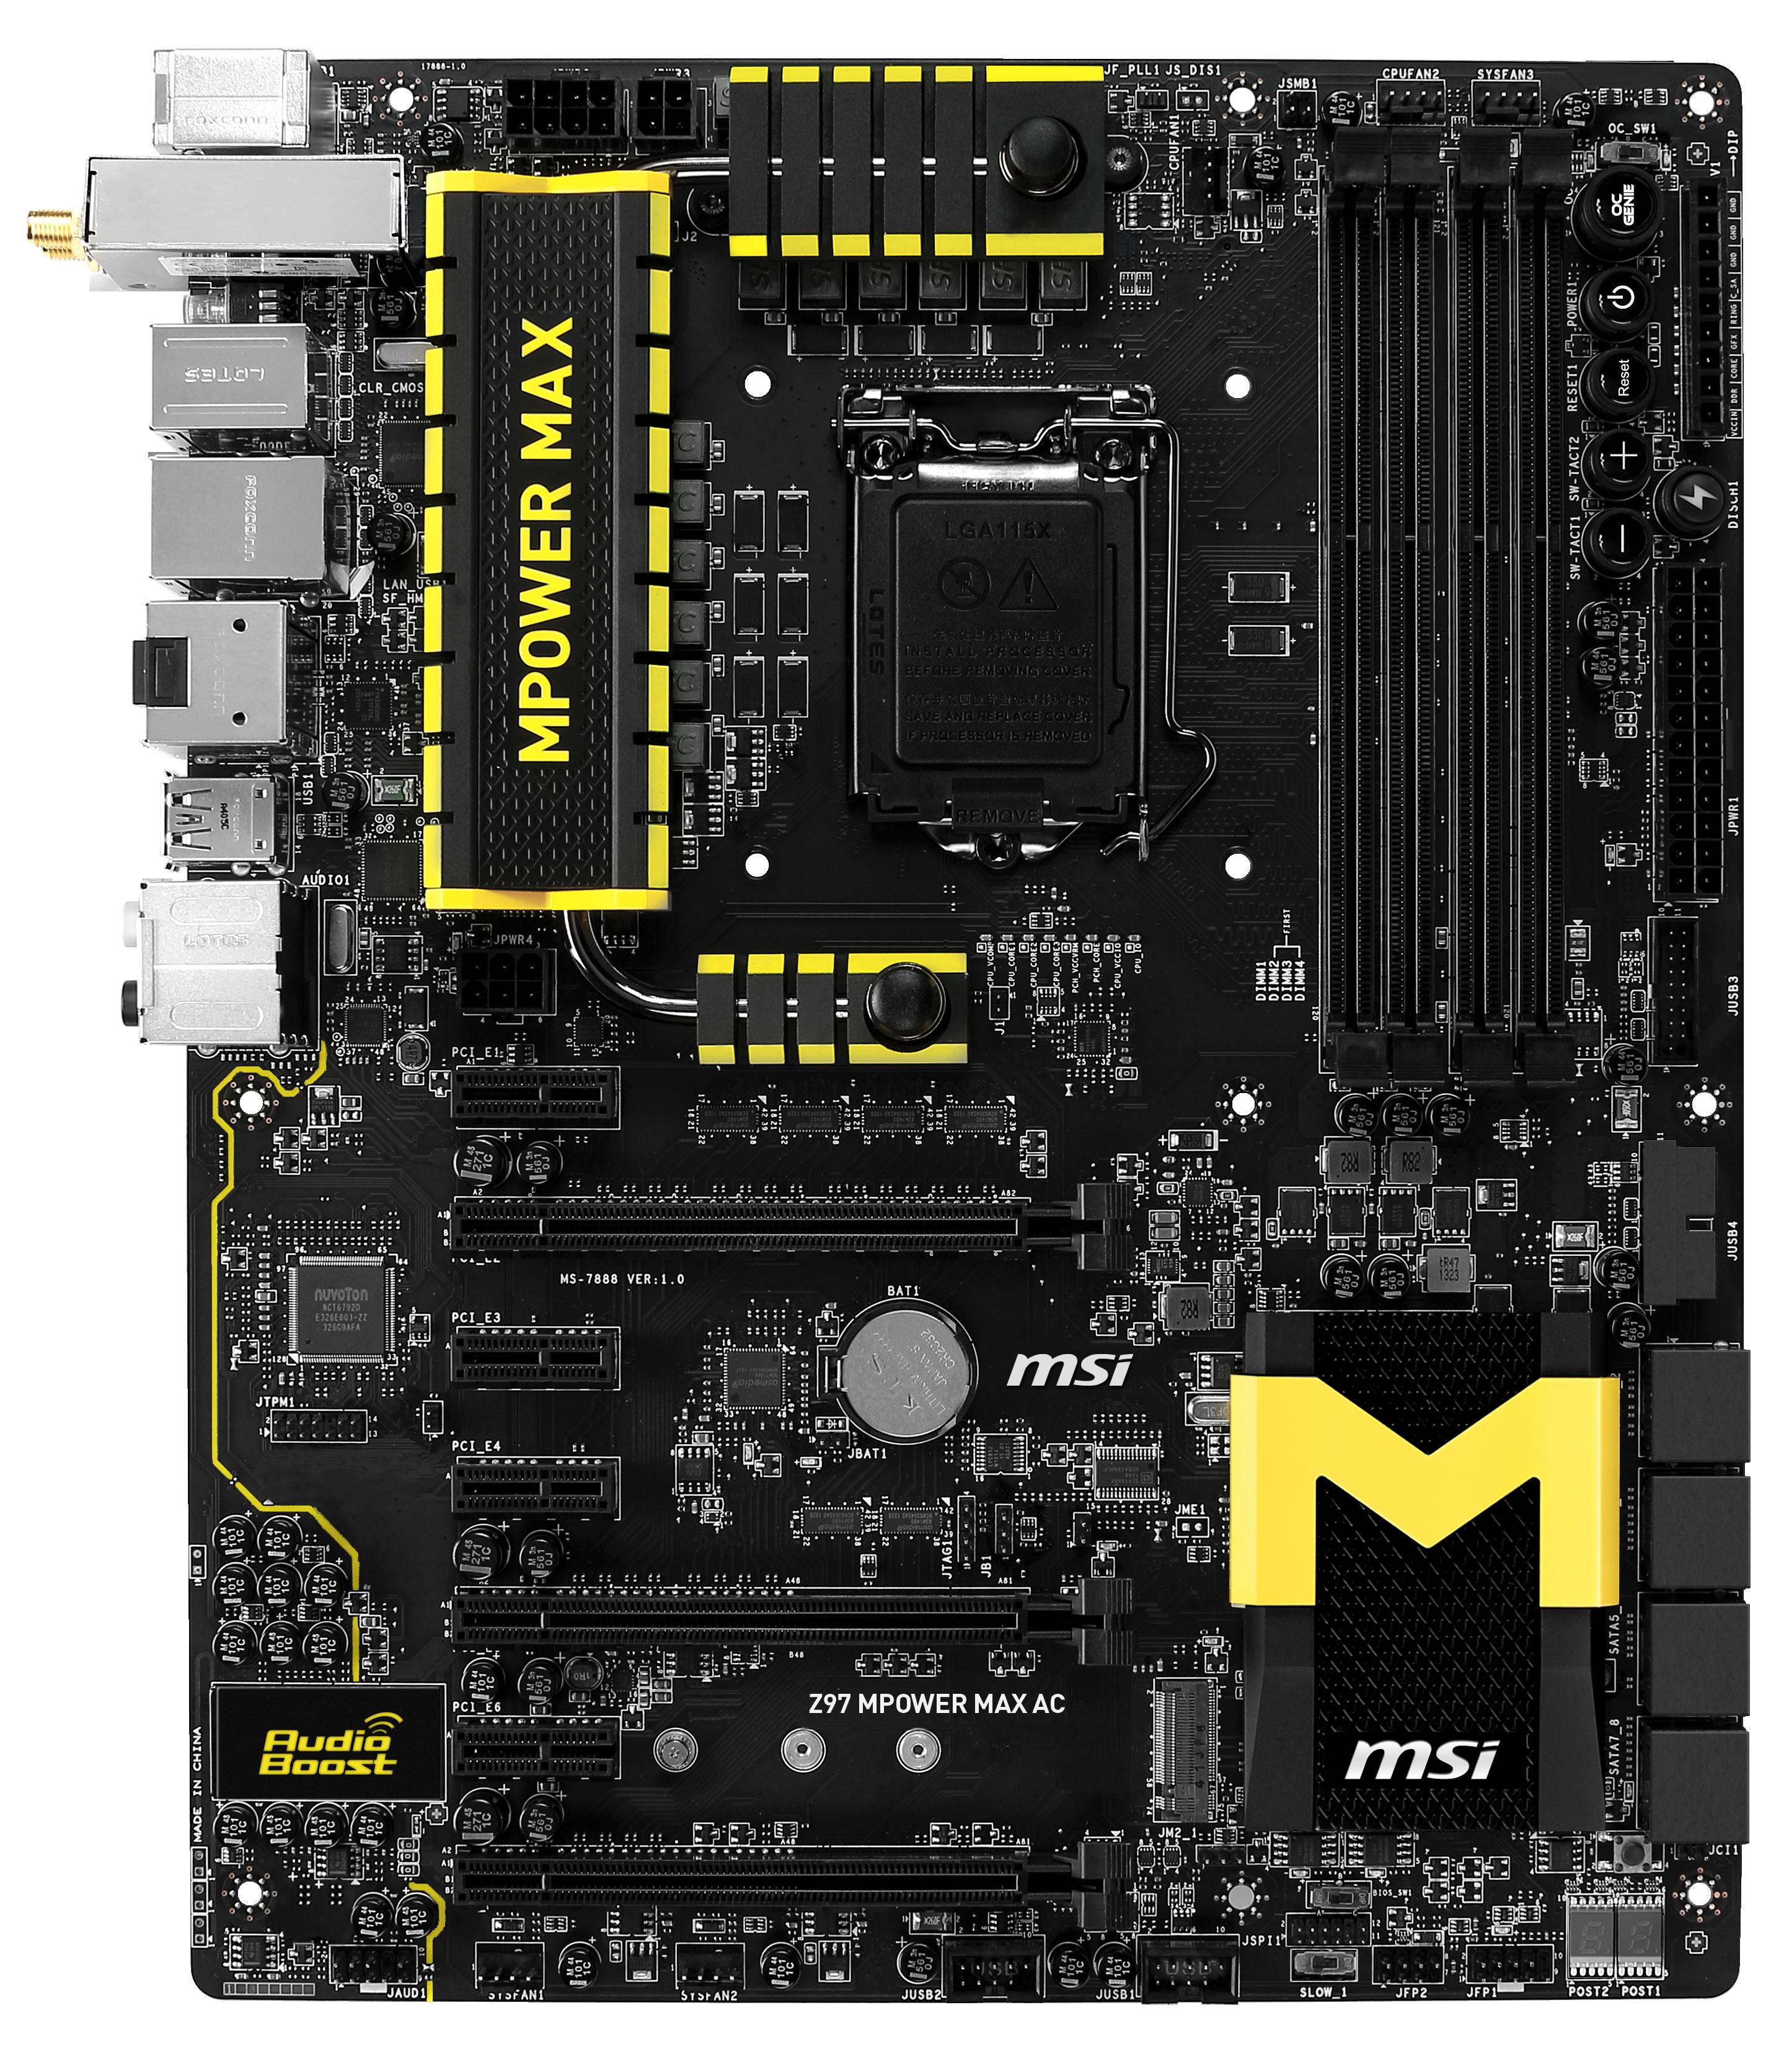 MSI Z97 MPOWER MAX AC BIOS CHIP